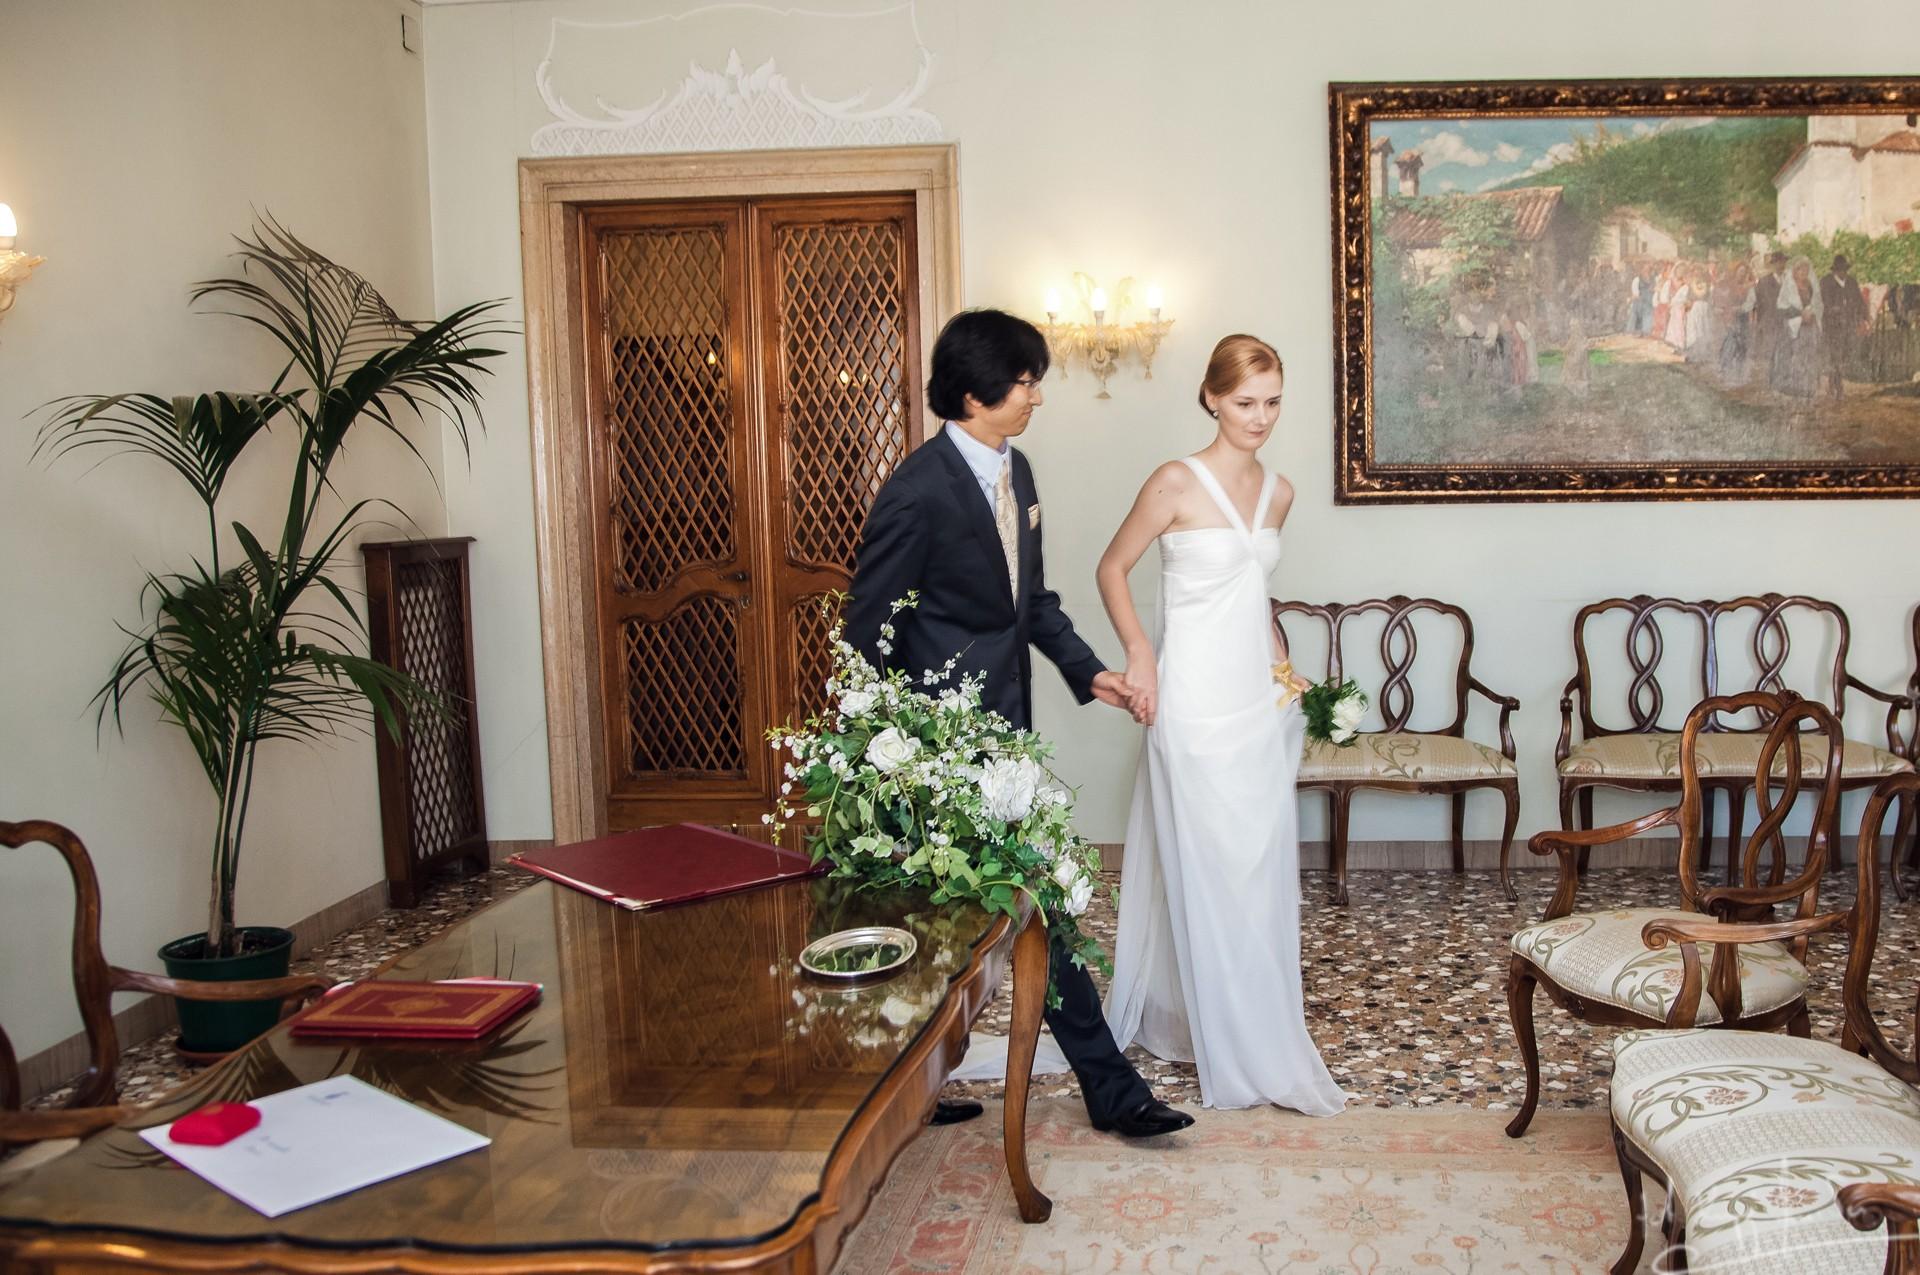 Ślub w wenecji 26 Manuela Luiza & Young Seon Song